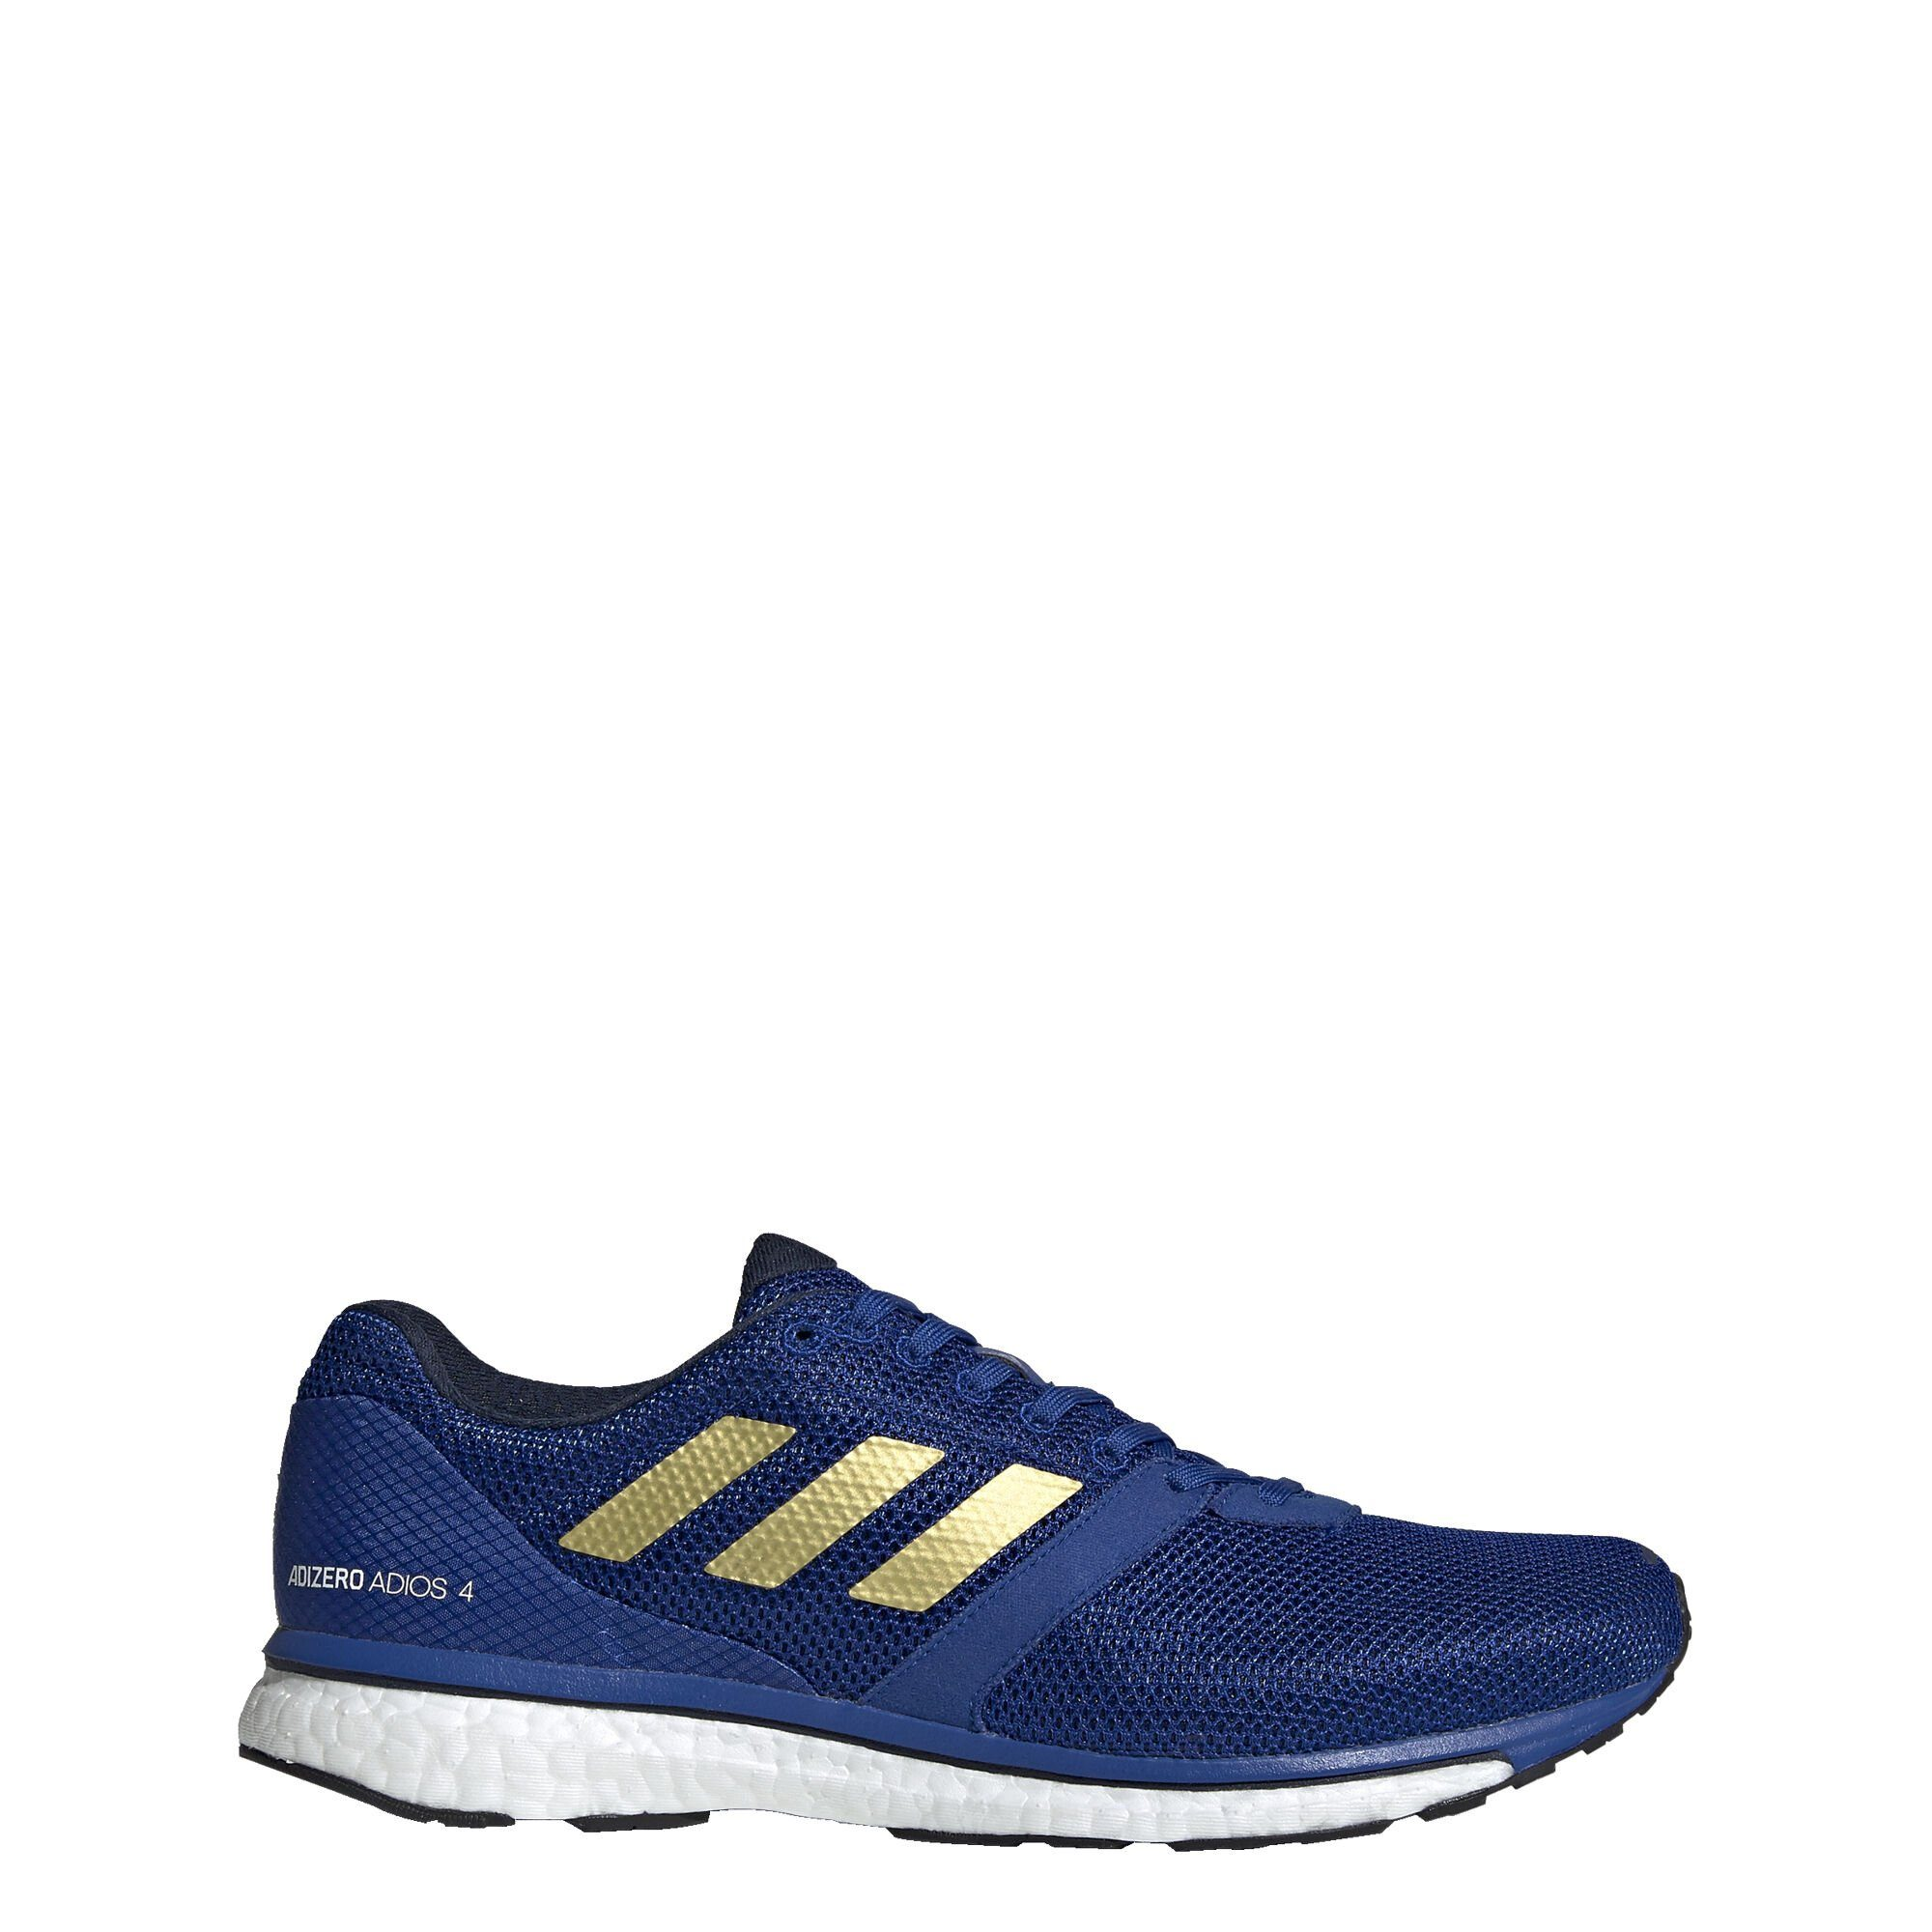 adidas Performance »Adizero Adios 4 Schuh« Laufschuh adizero online kaufen | OTTO